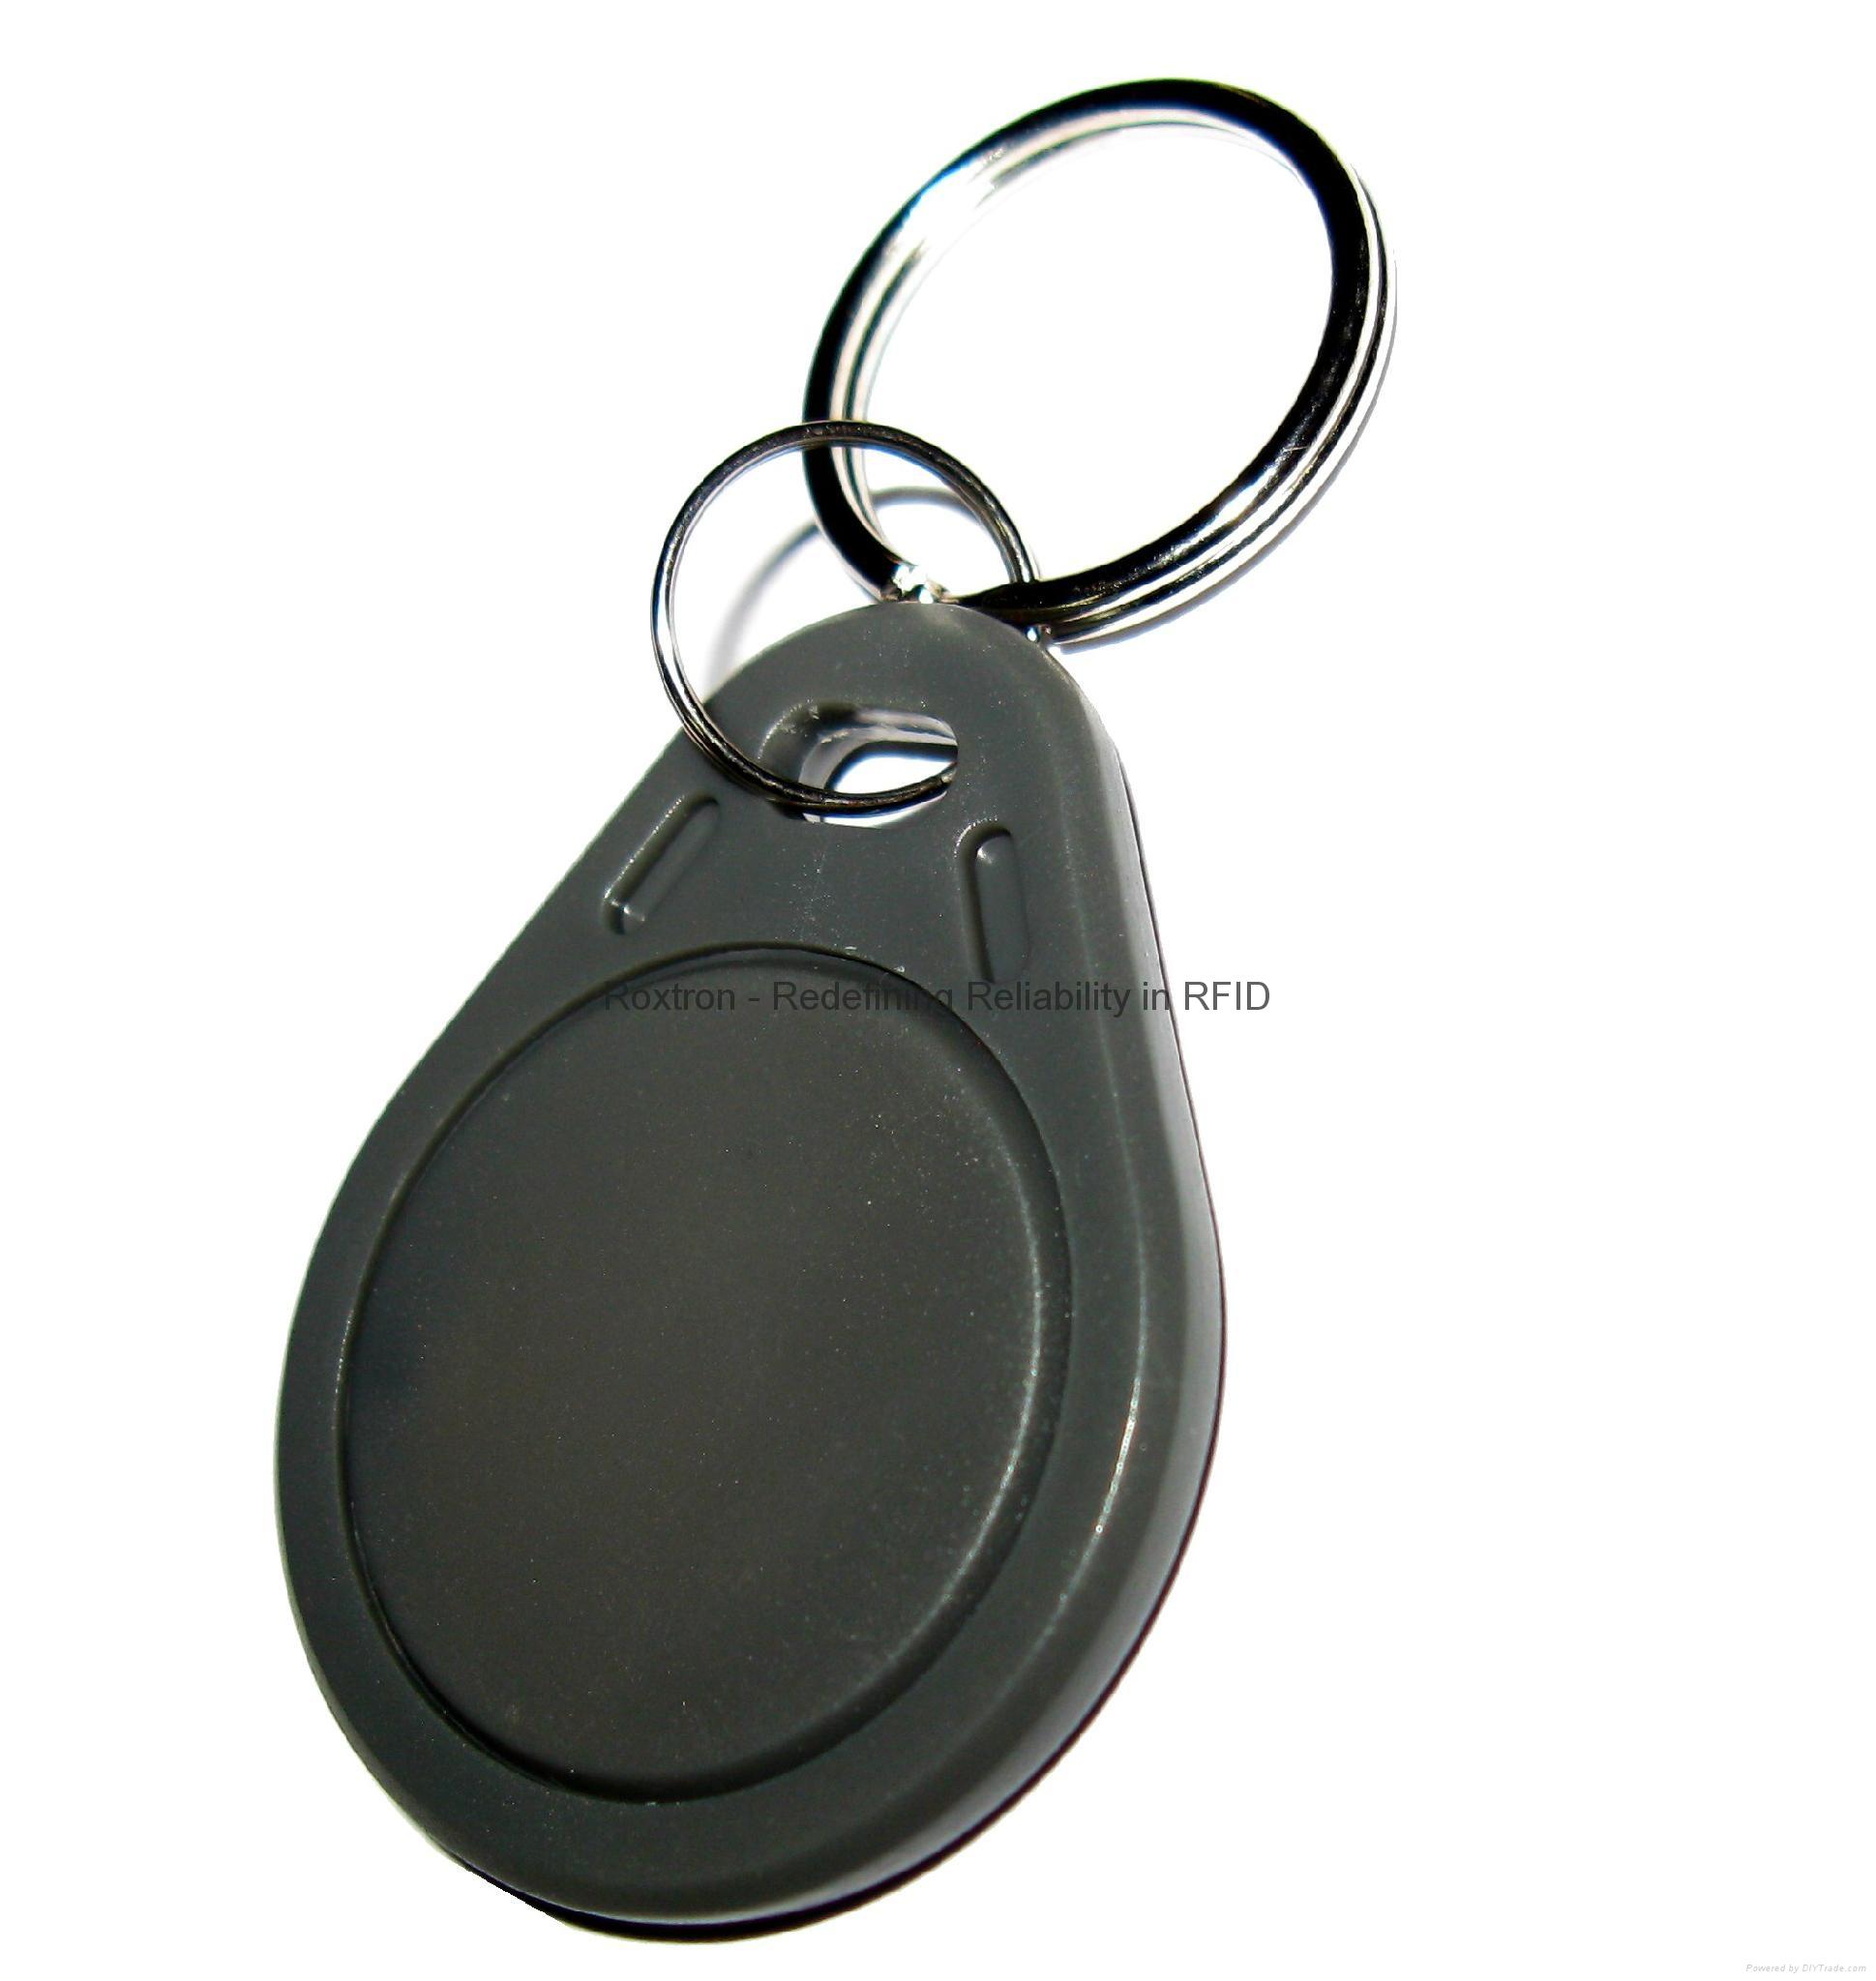 TK4100 RXK04 Key Tag 18